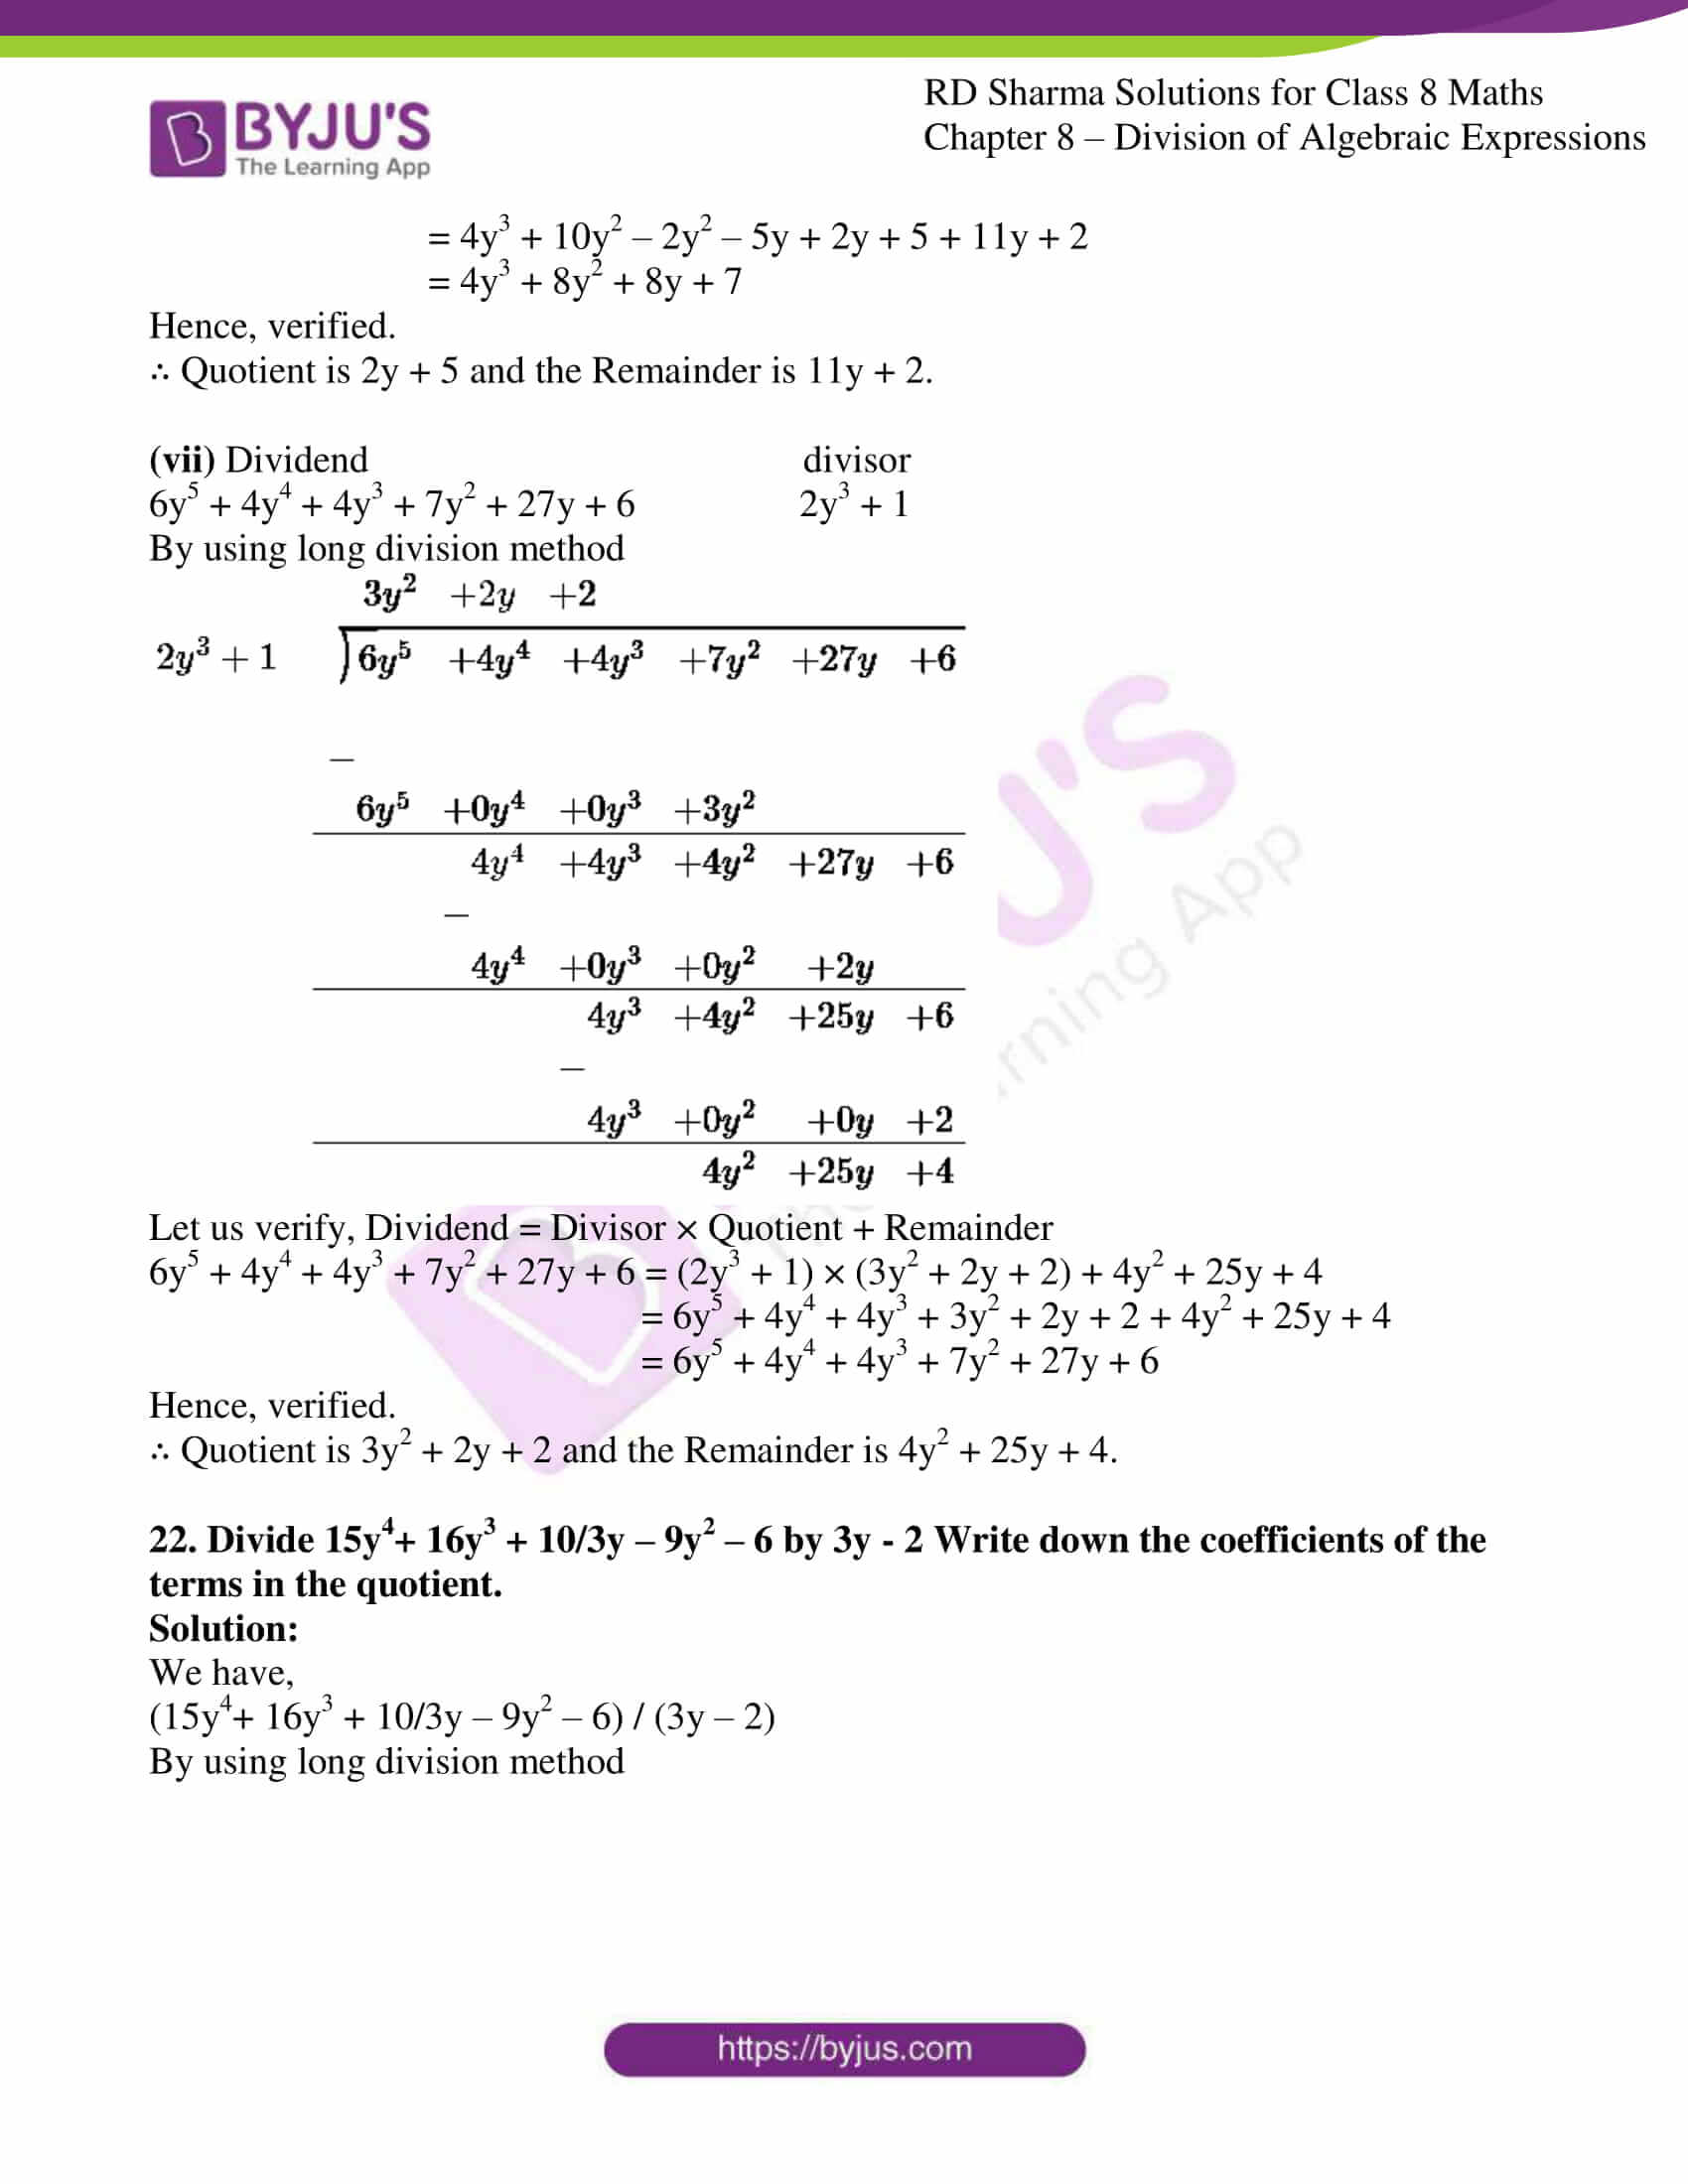 rd sharma class 8 maths chapter 8 exercise 4 14